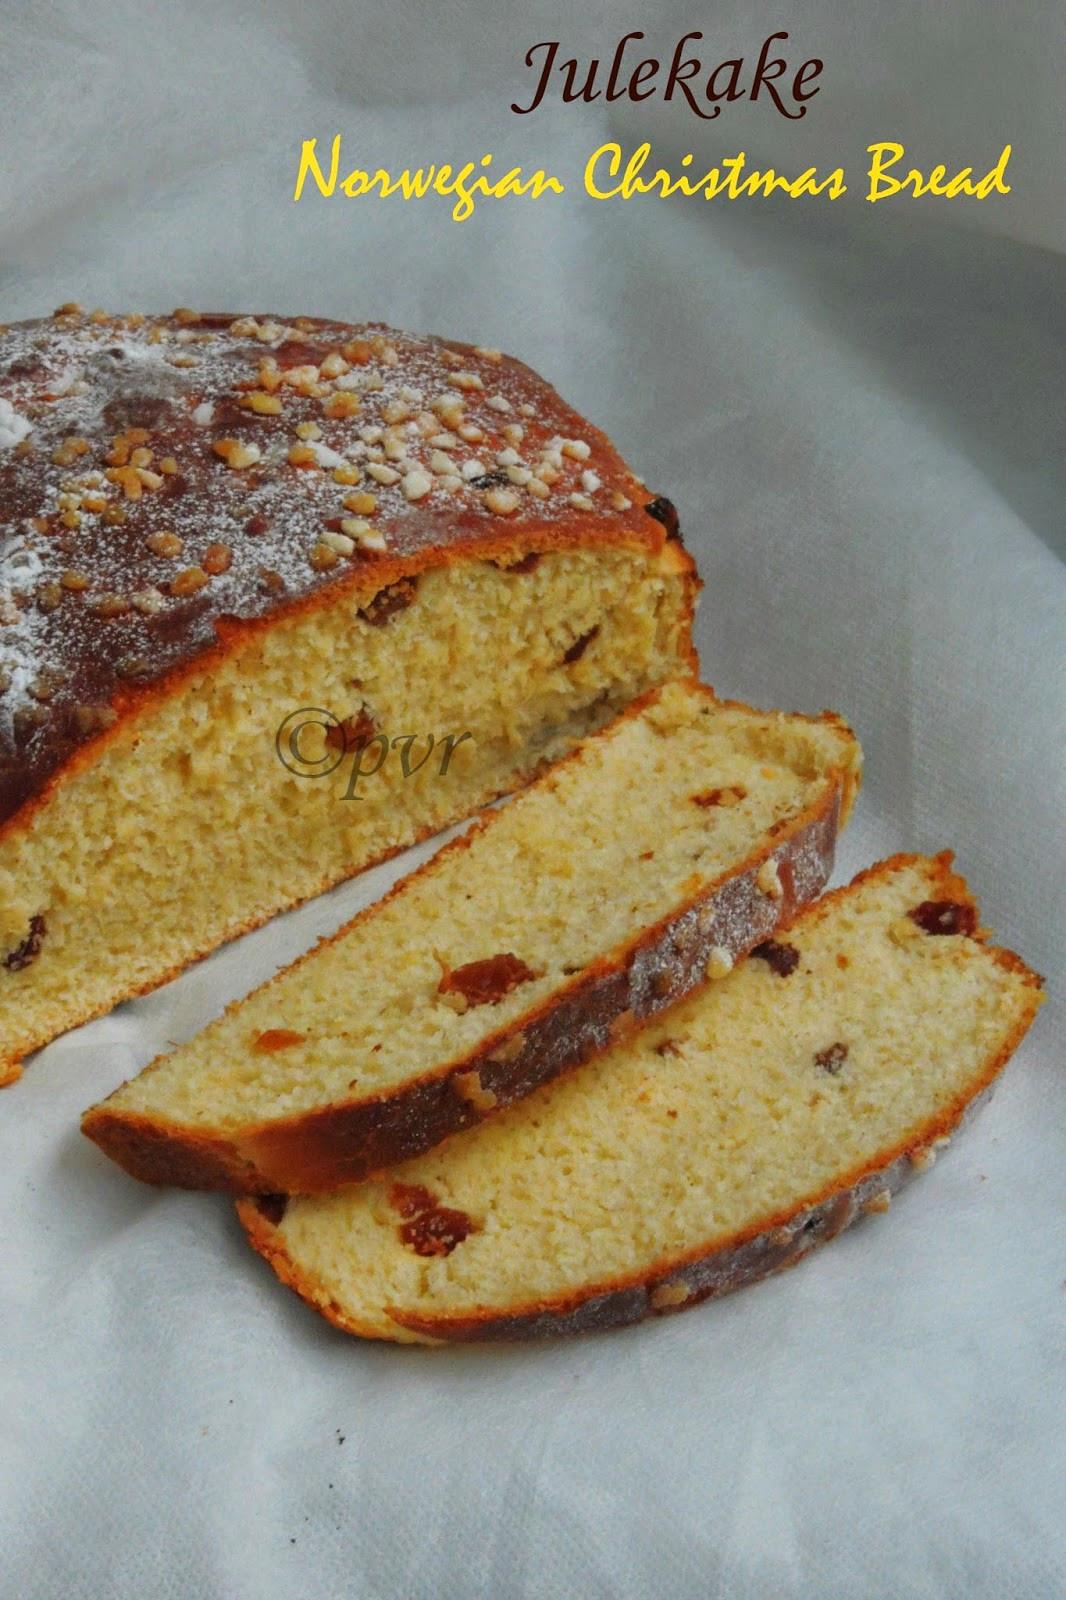 Julekake Norwegian Christmas Bread Recipe  Julekake A Norwegian Christmas Bread Indian Simmer